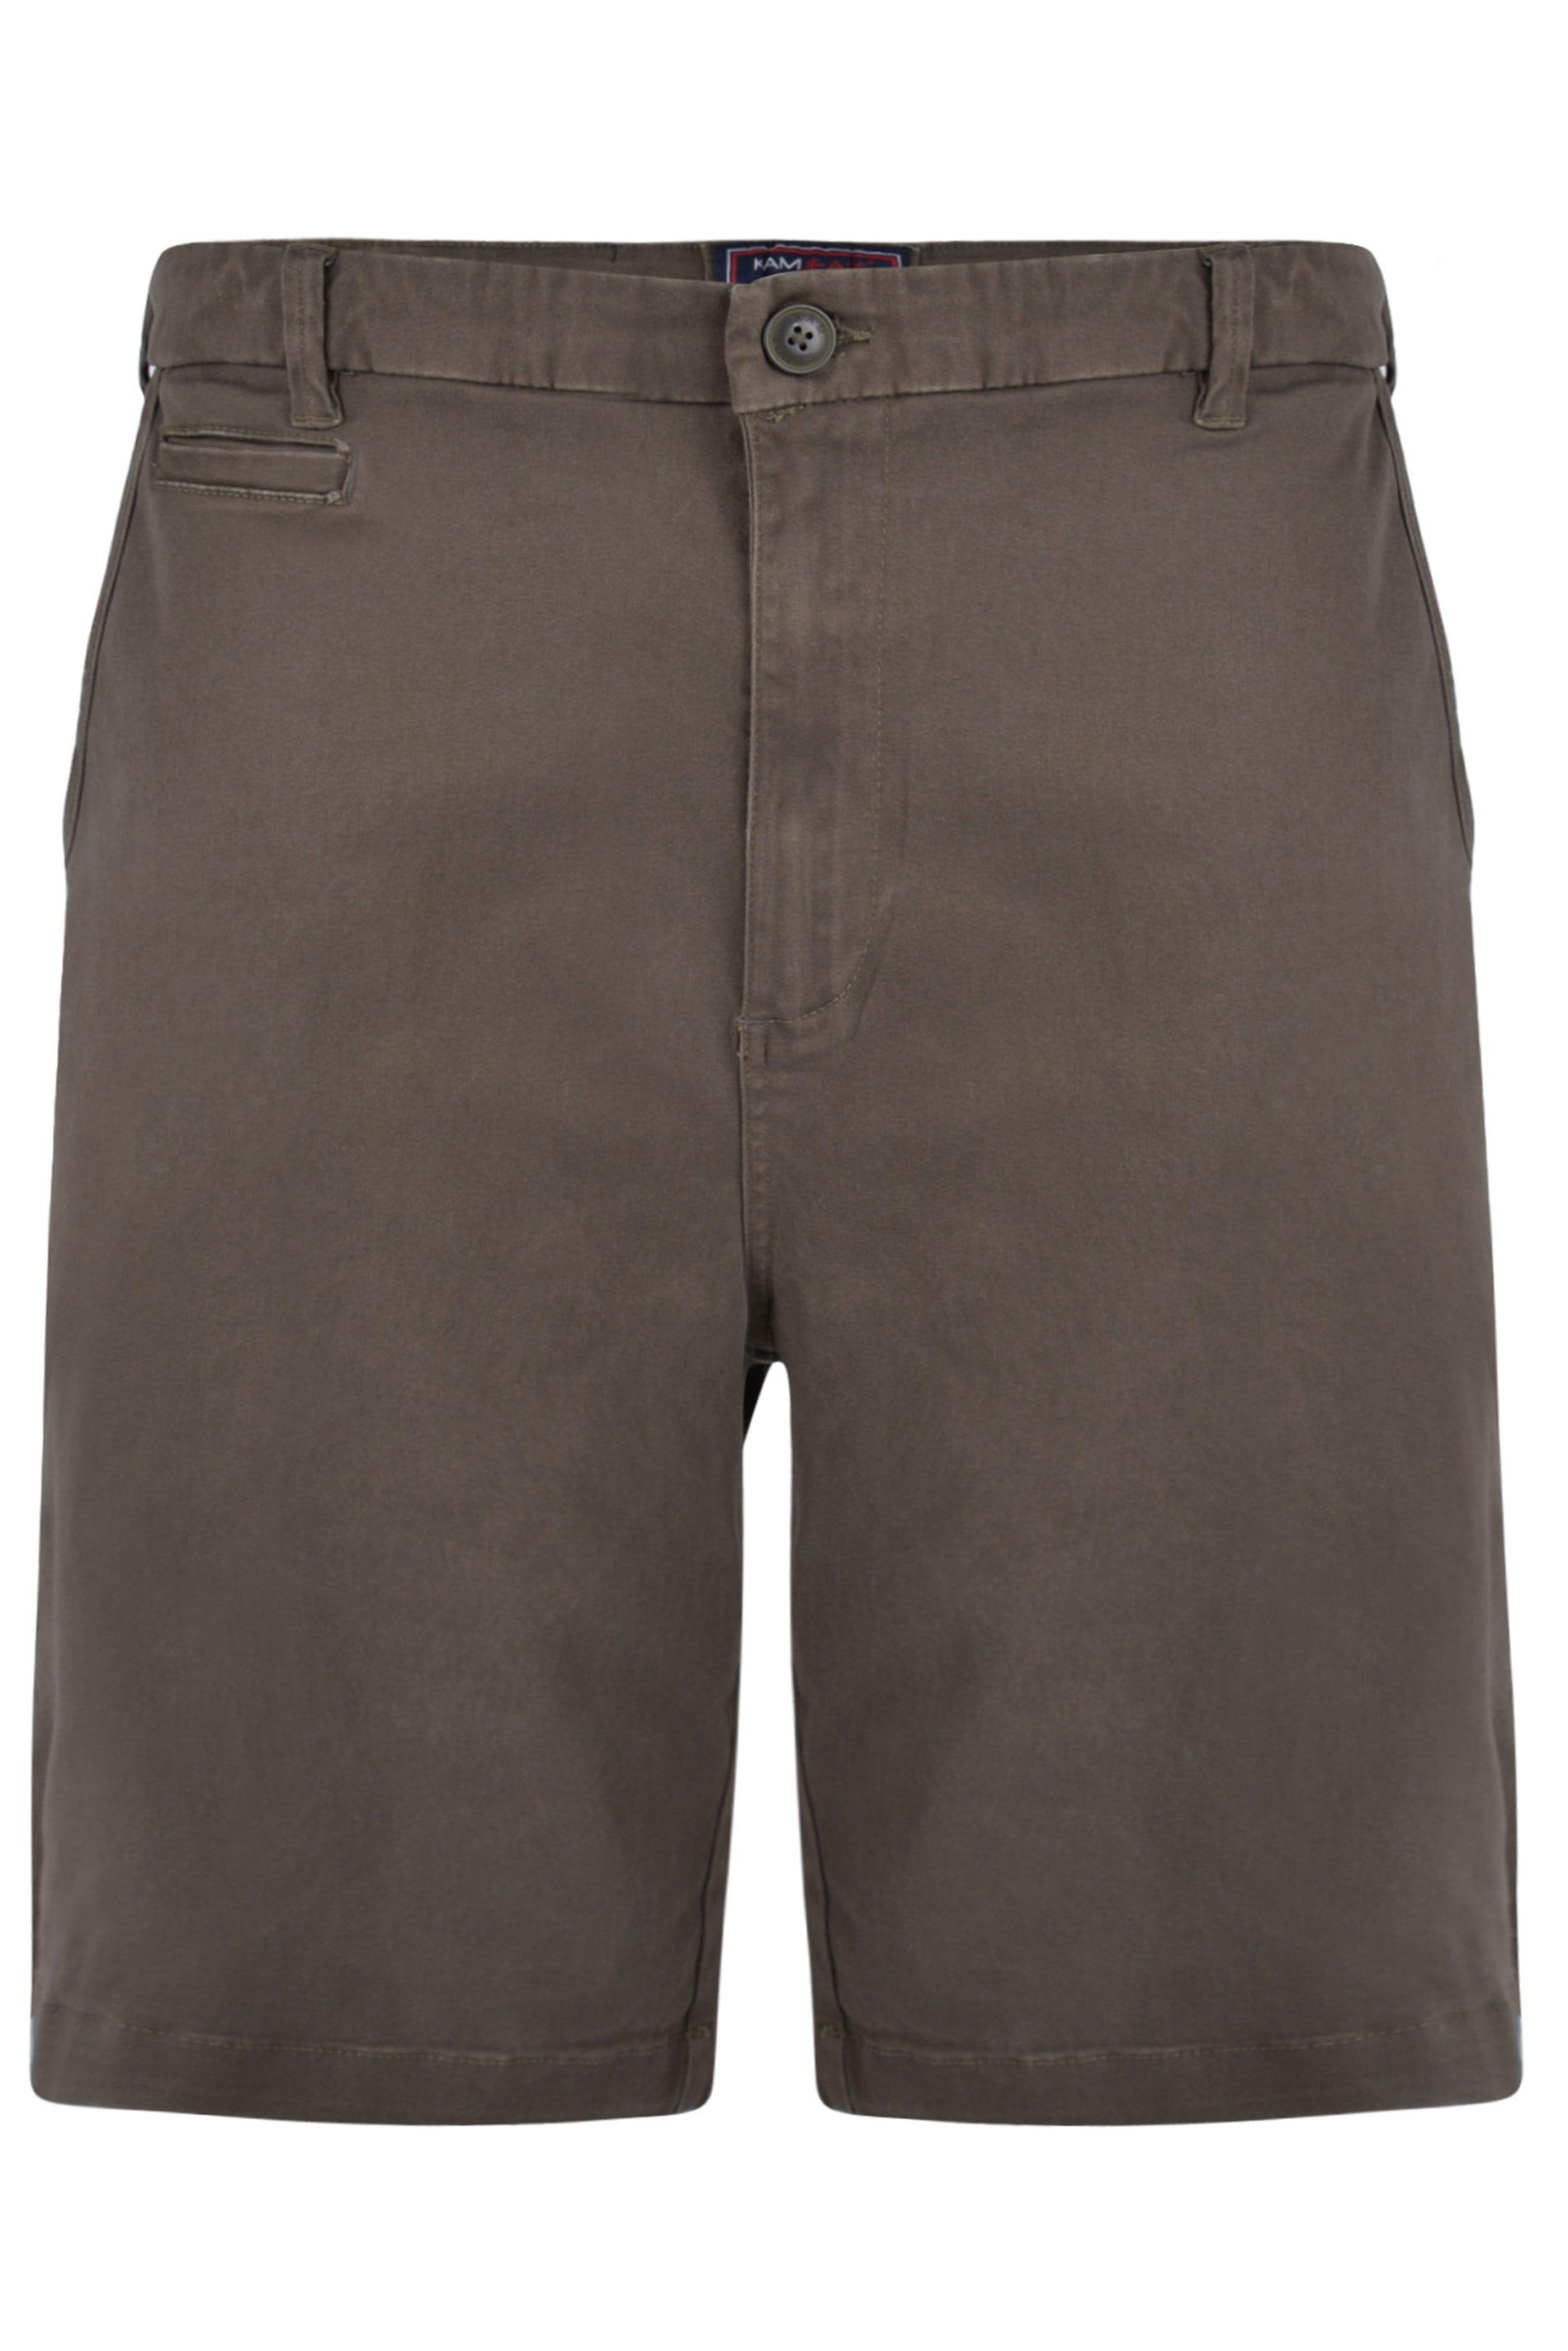 KAM Khaki Chino Shorts